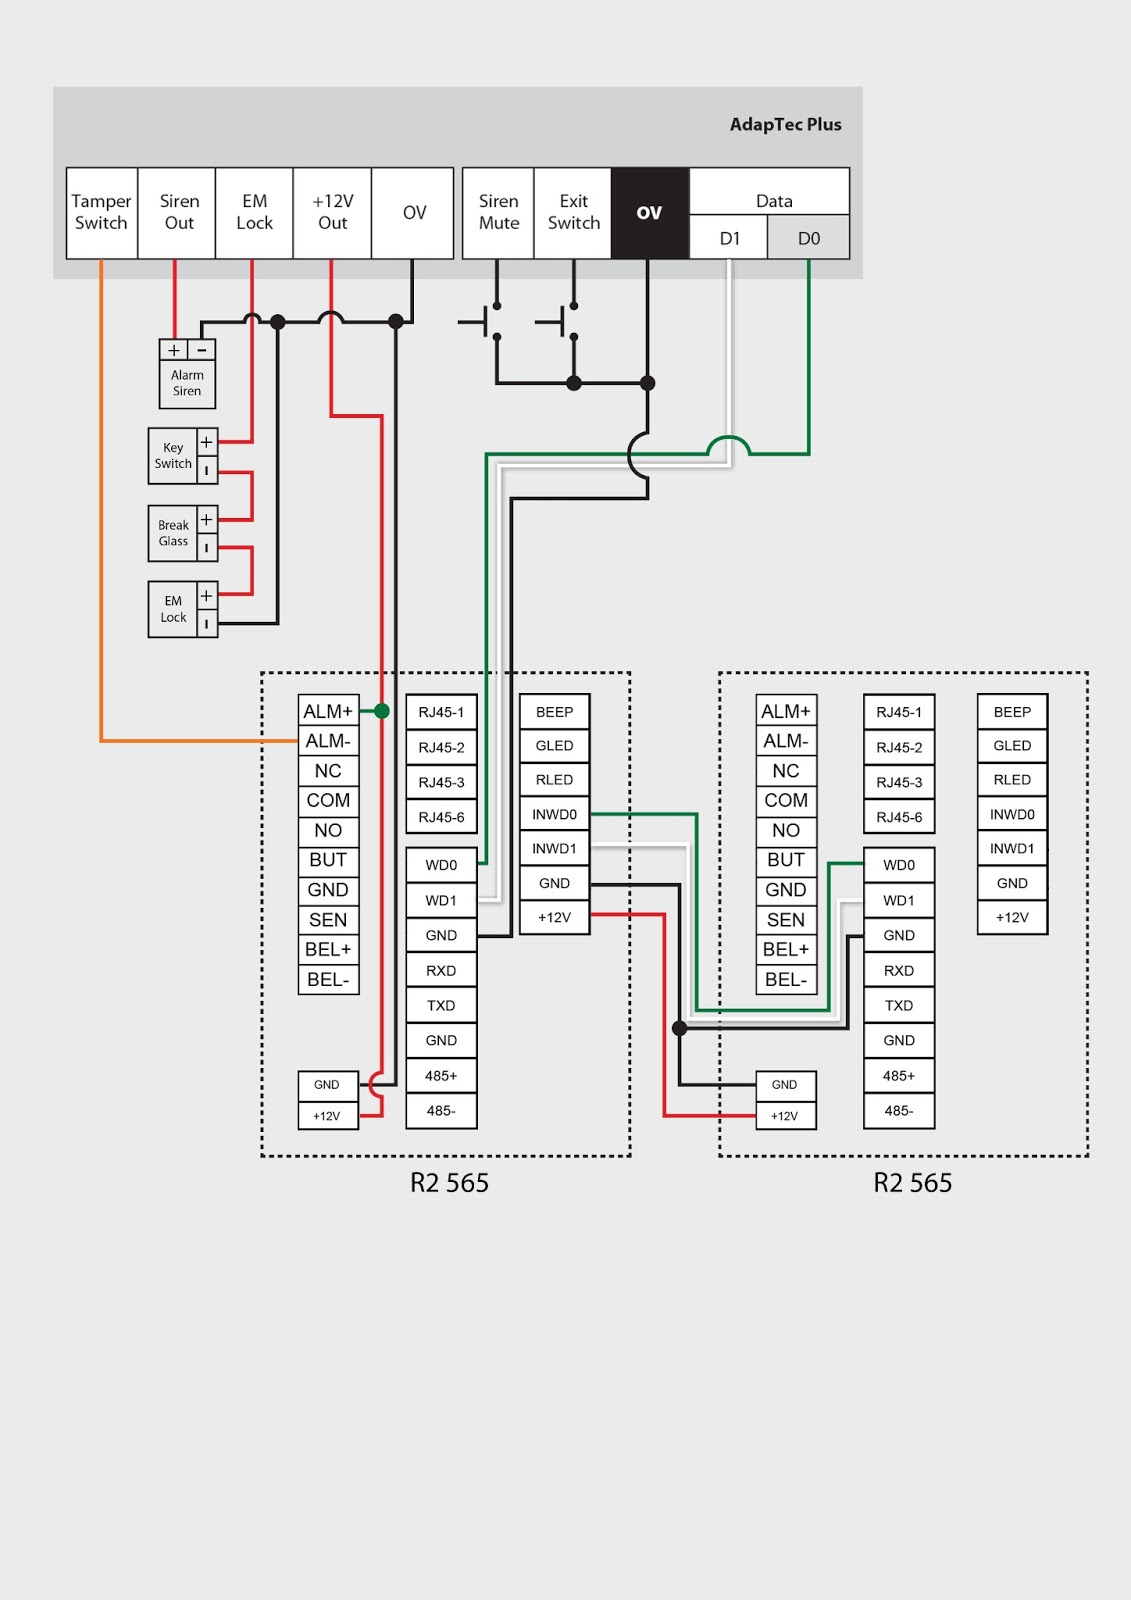 r2 565 r2 565 master slave wiring diagram settings [ 1131 x 1600 Pixel ]